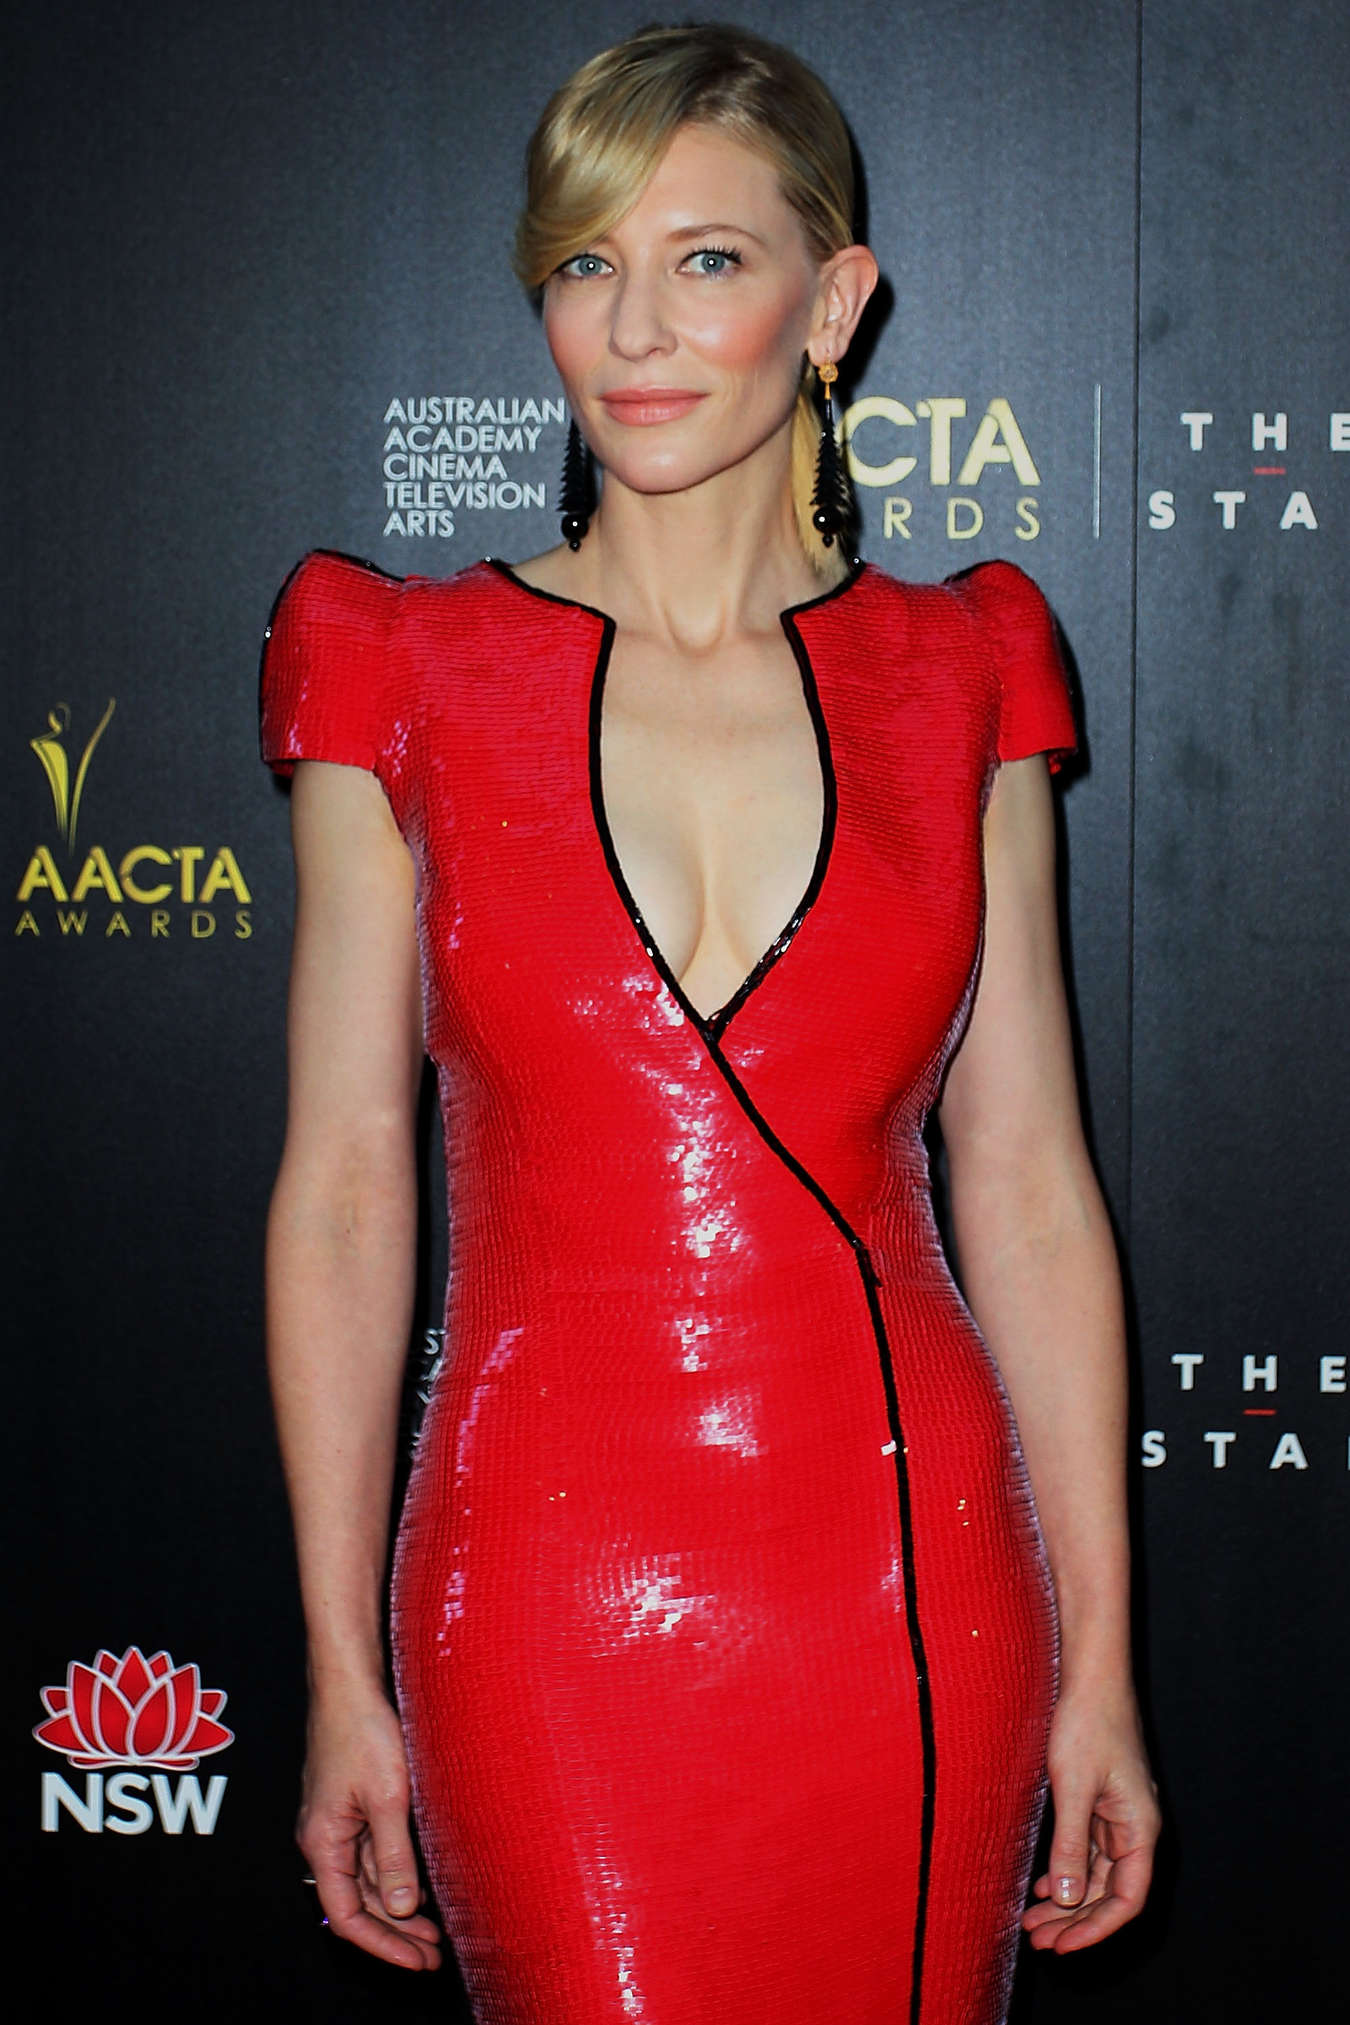 aacta awards - photo #38